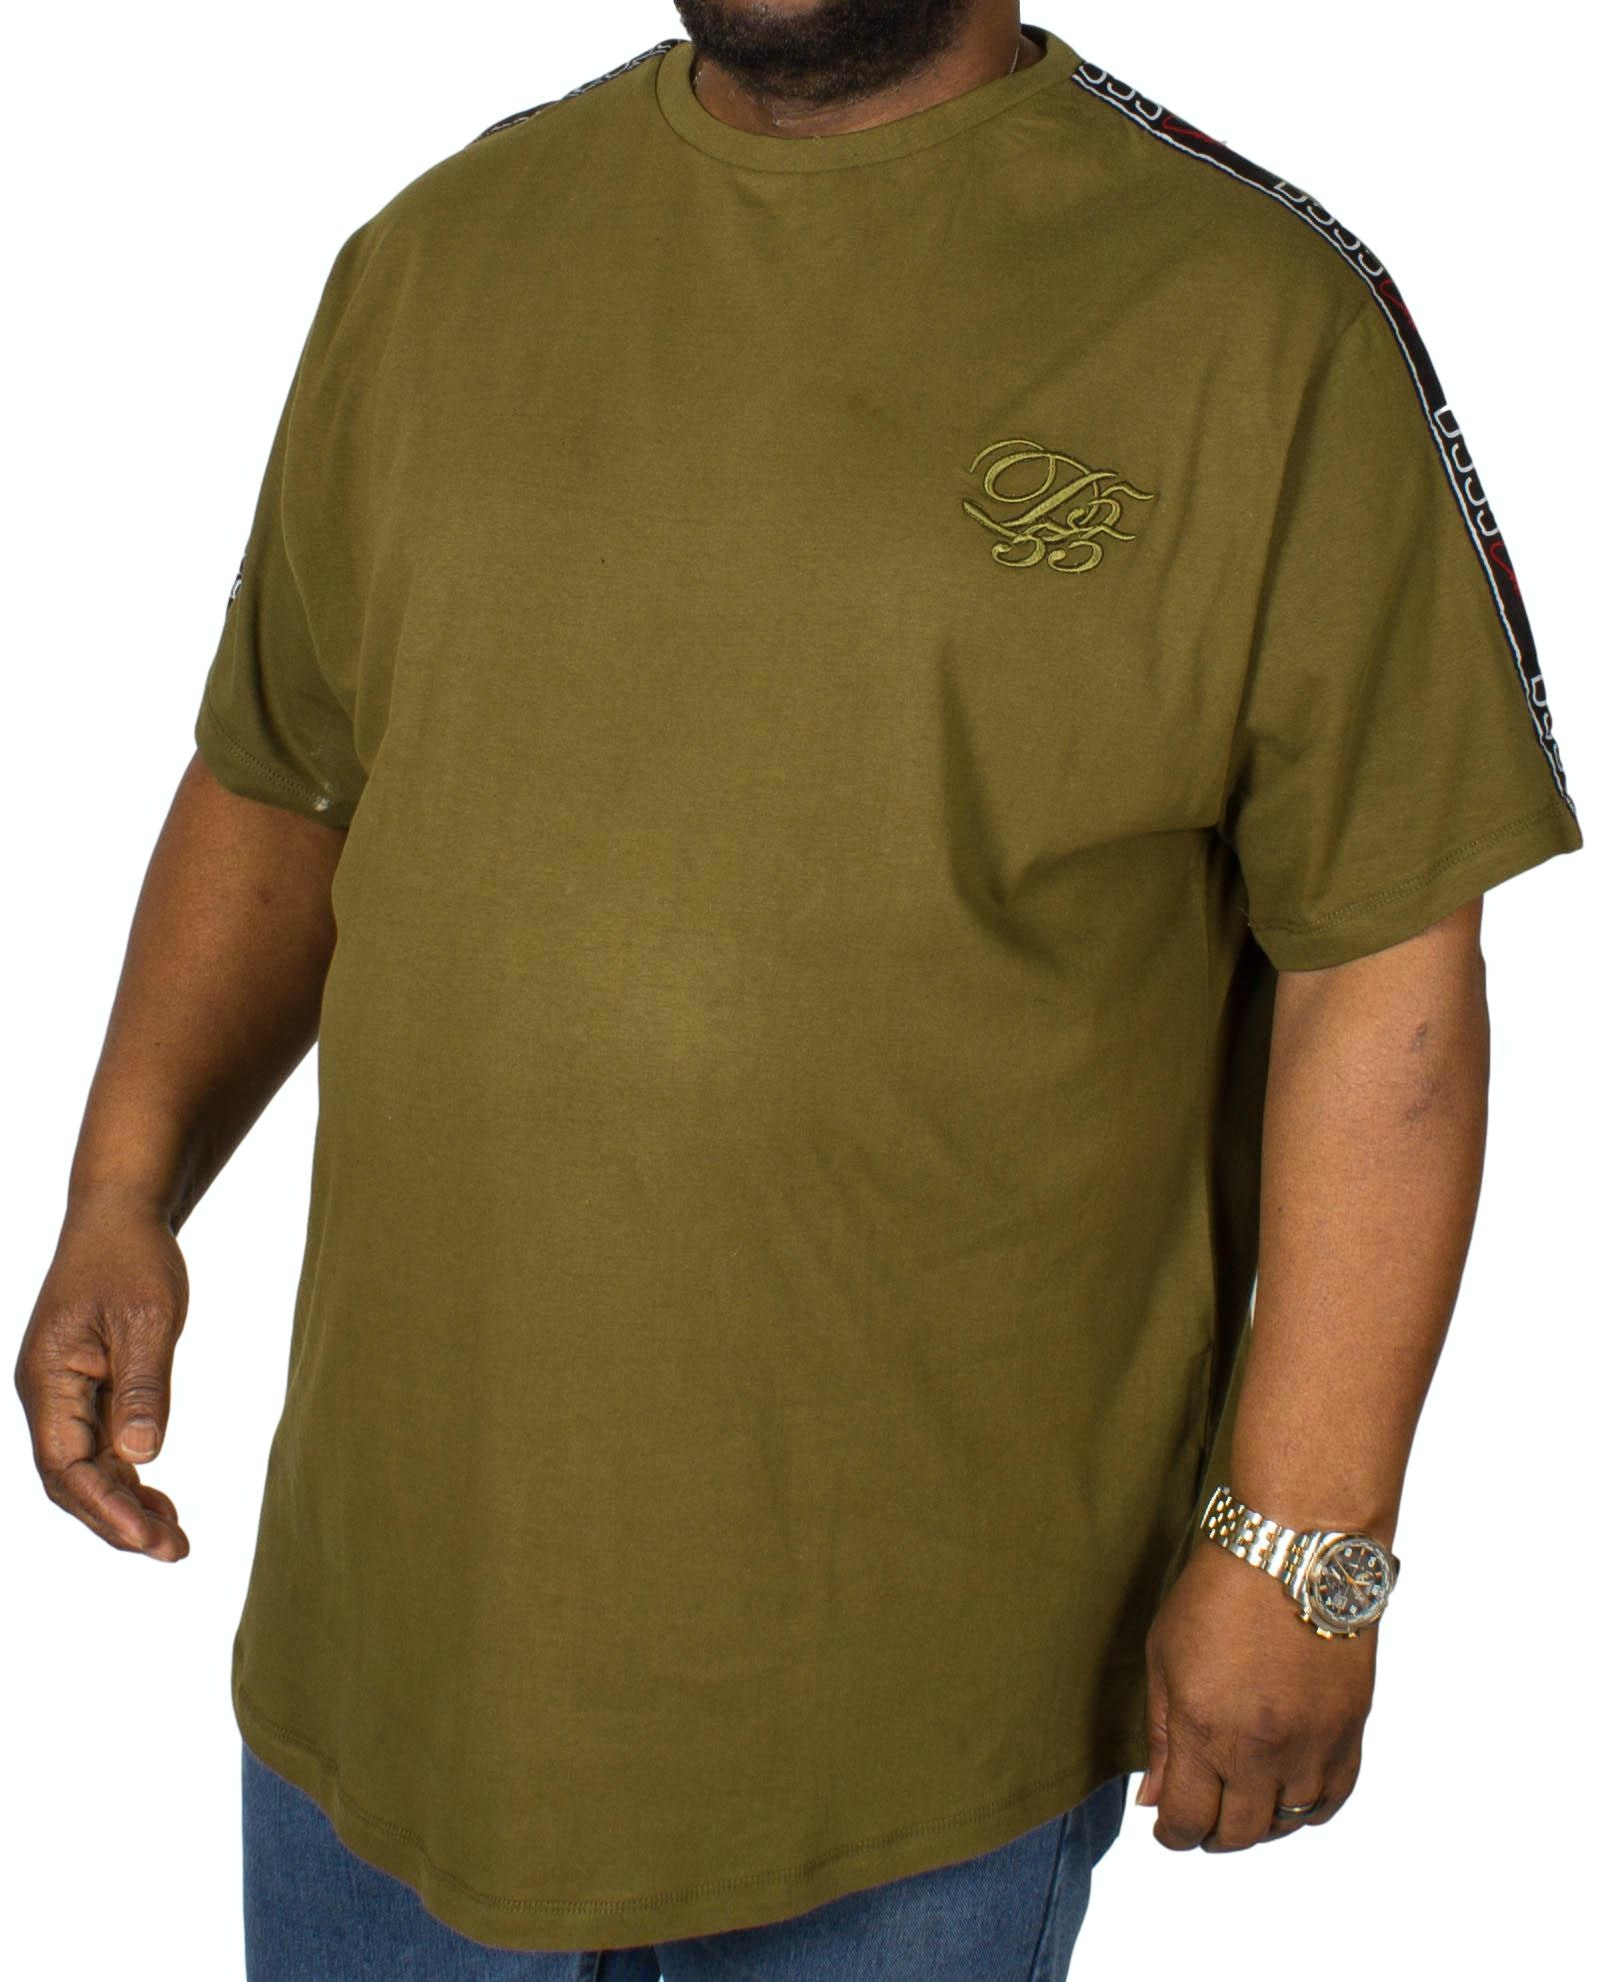 D555 Kambria Embroidered T-Shirt Khaki